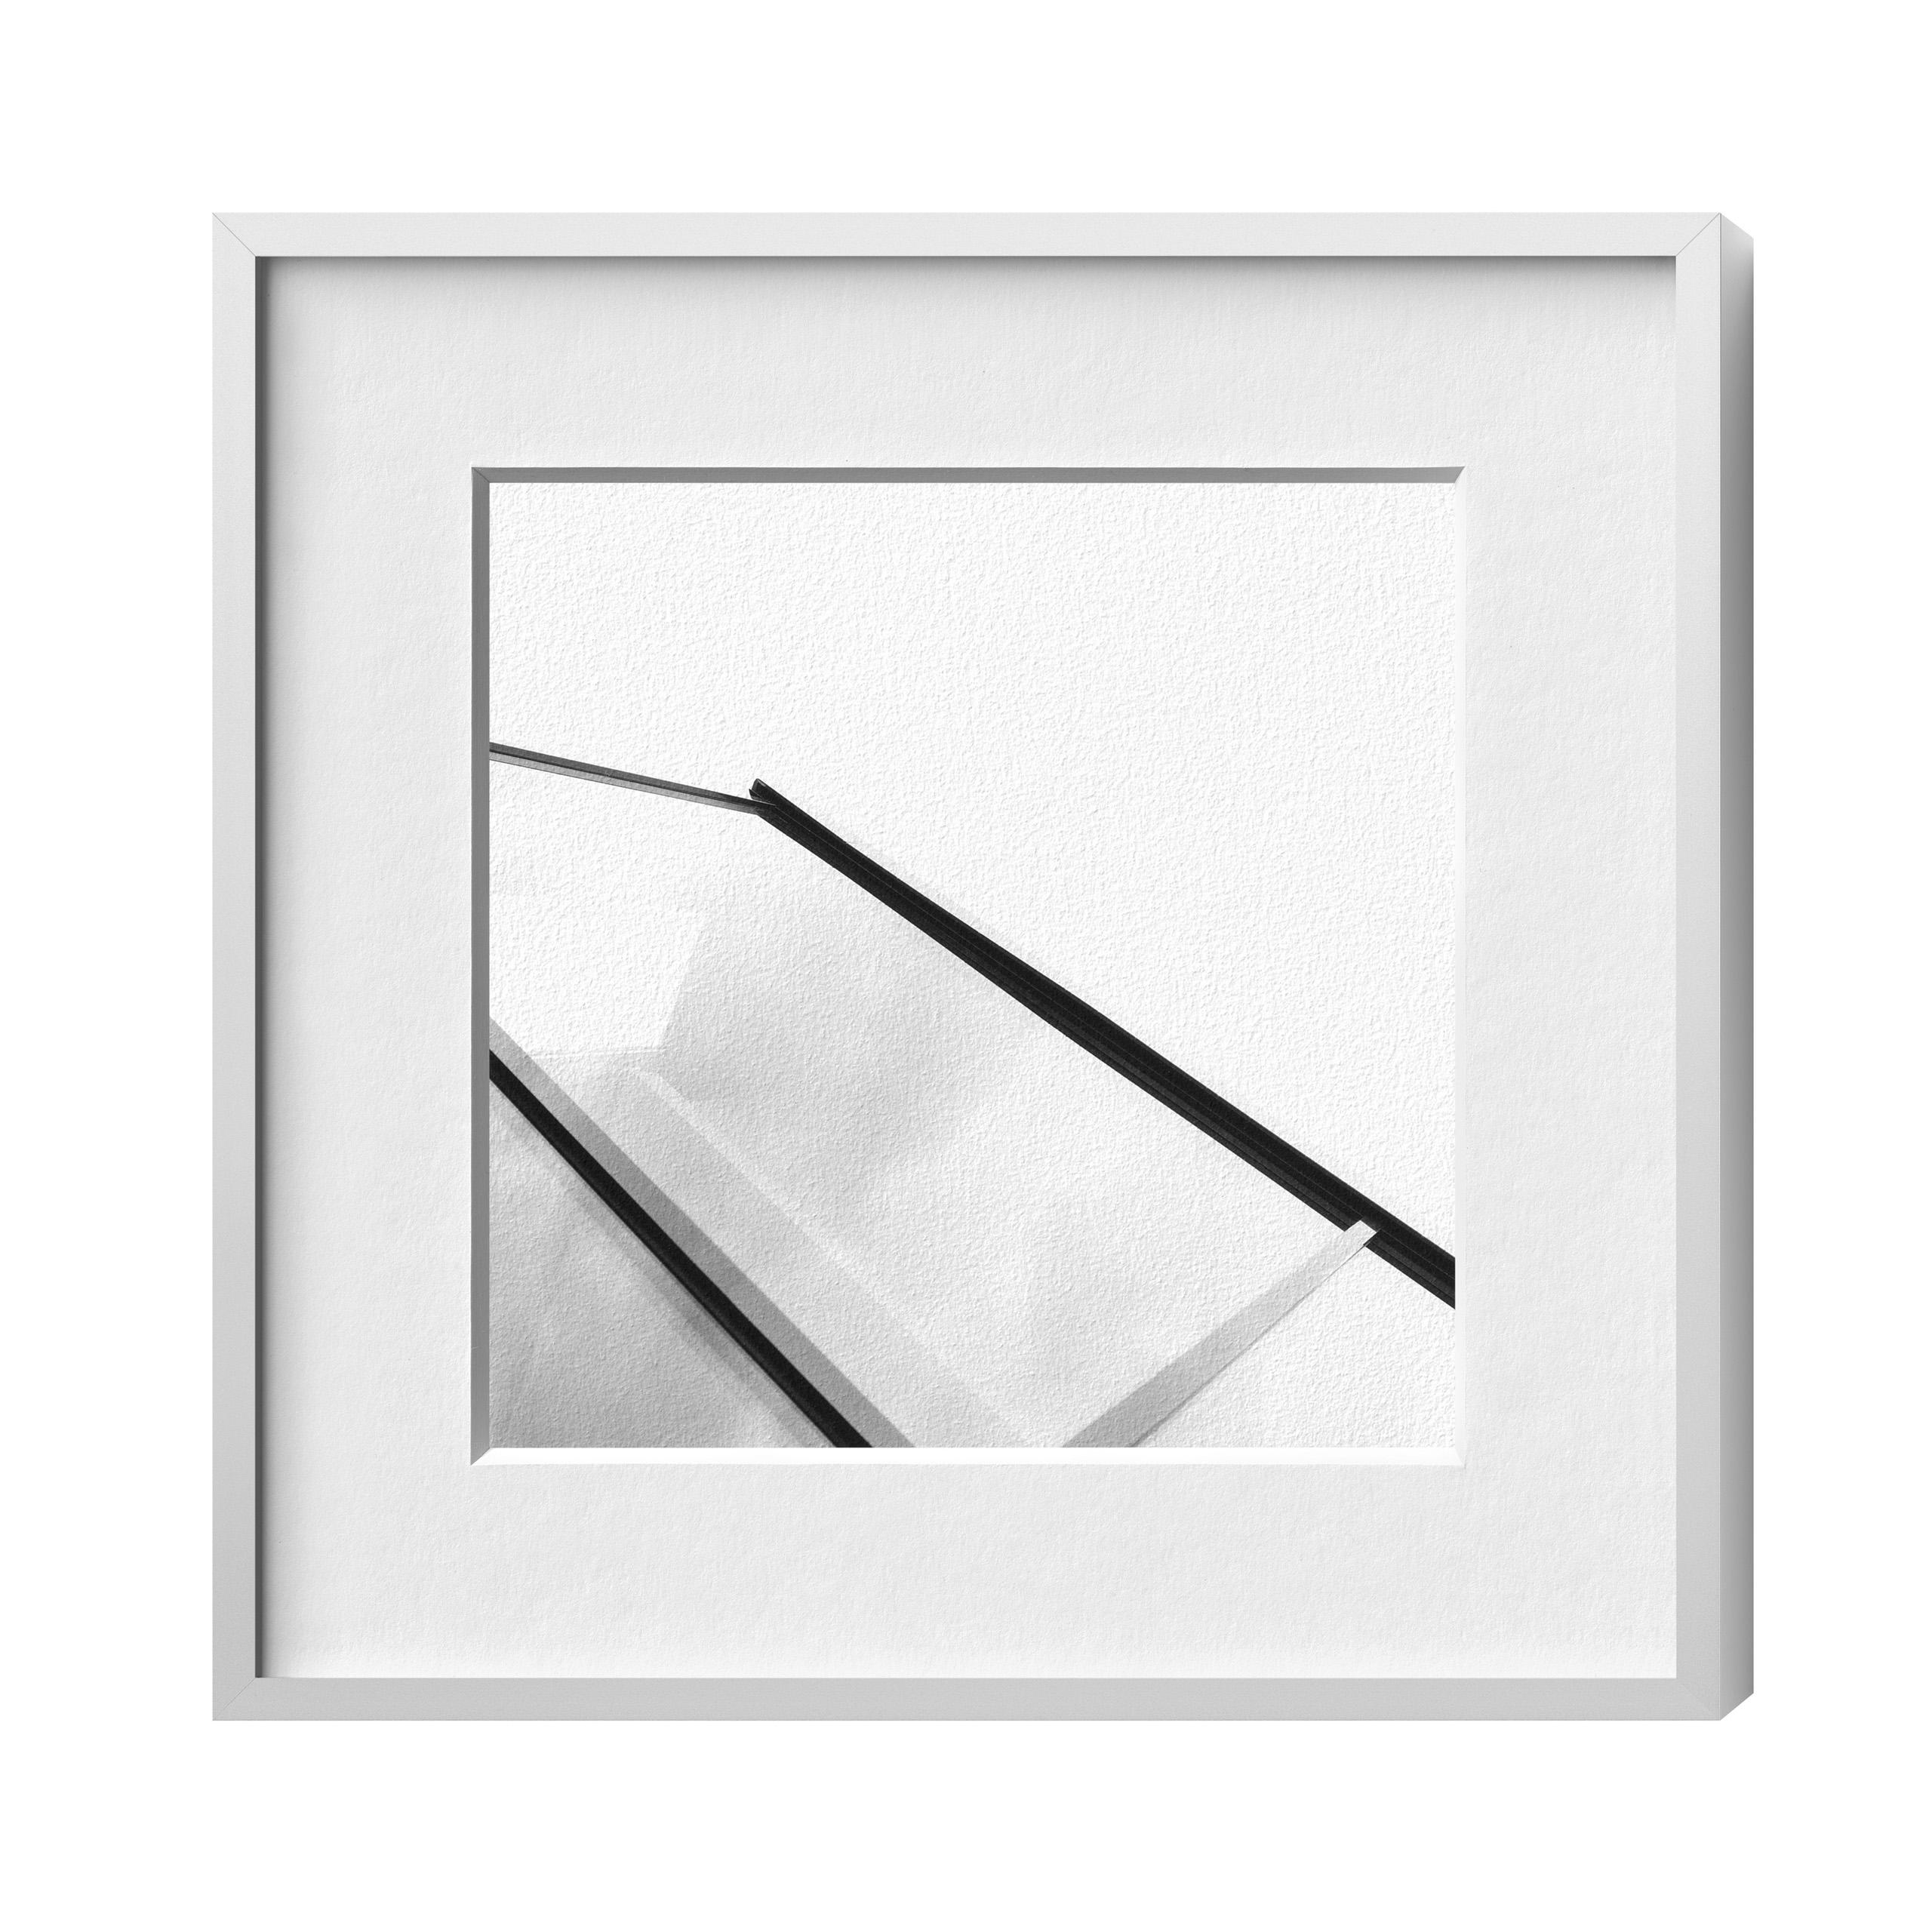 Conservo Alu 8, Silber matt, Plexiglas glä., 210 x 210 | HALBE-Rahmen